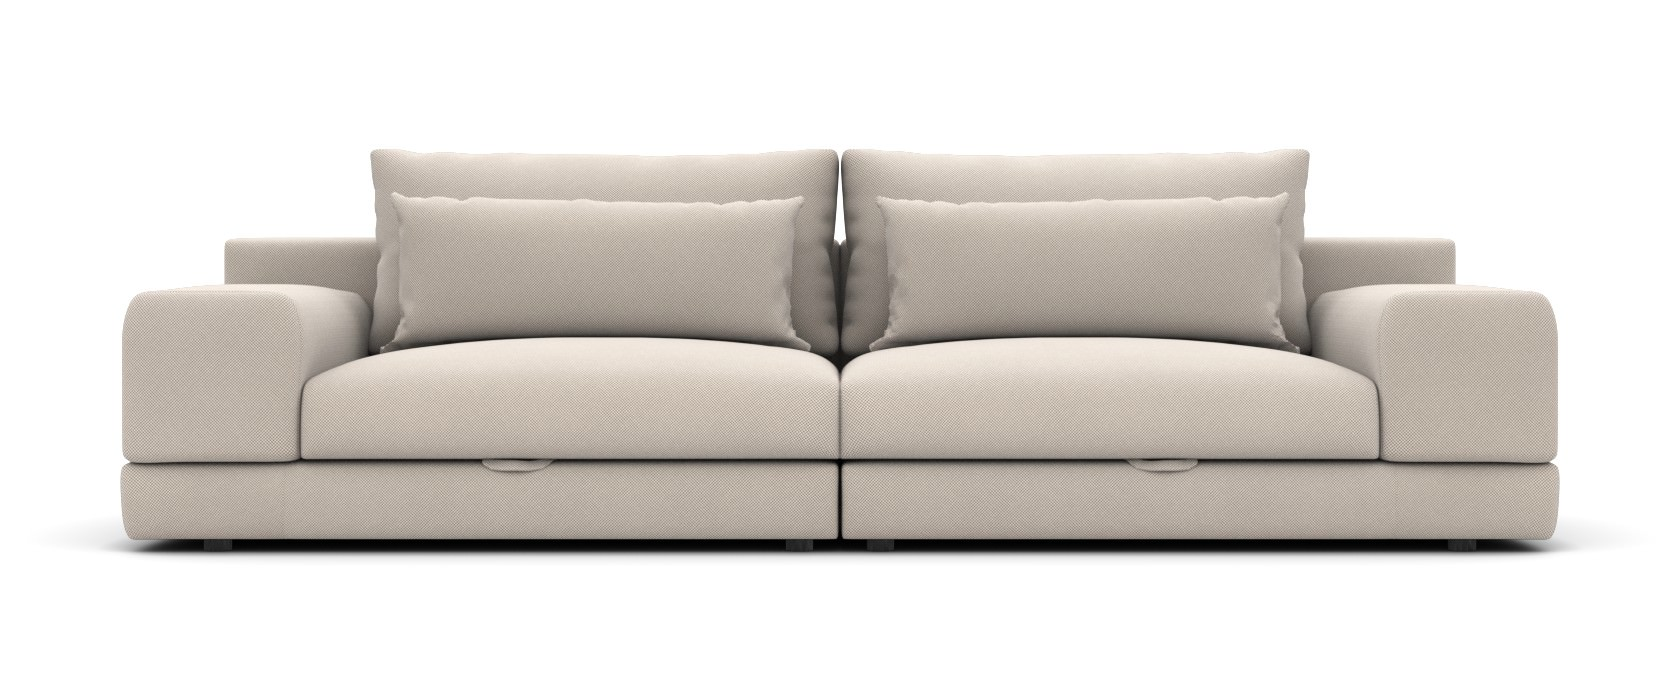 Трехместный диван Dario - Фото 1 - Pufetto